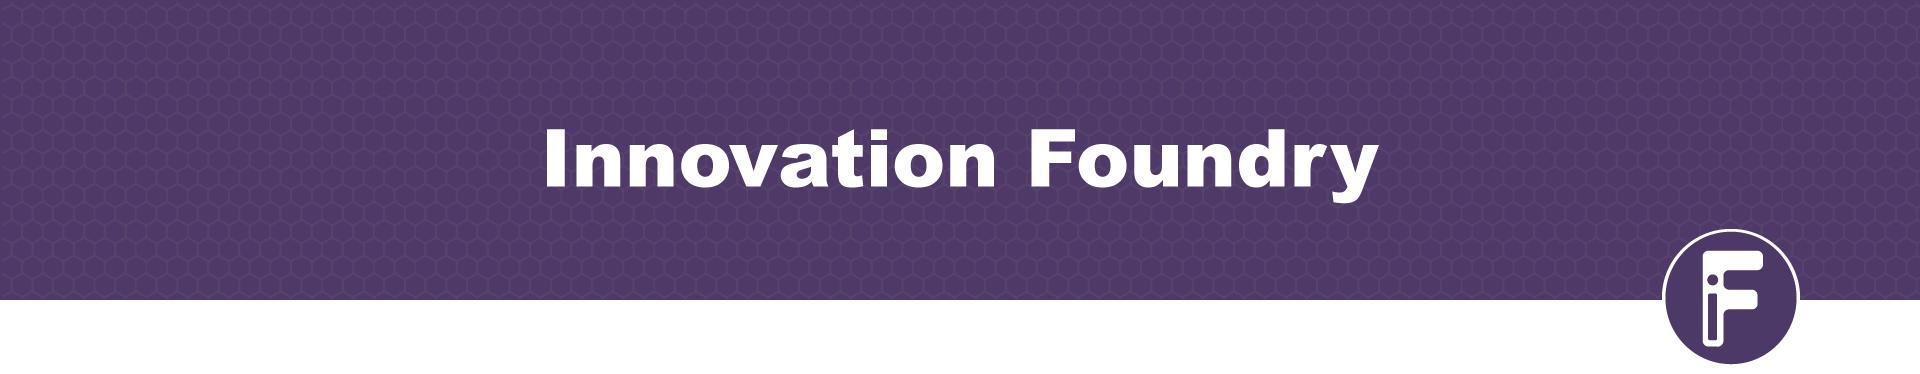 Innovation Foundry